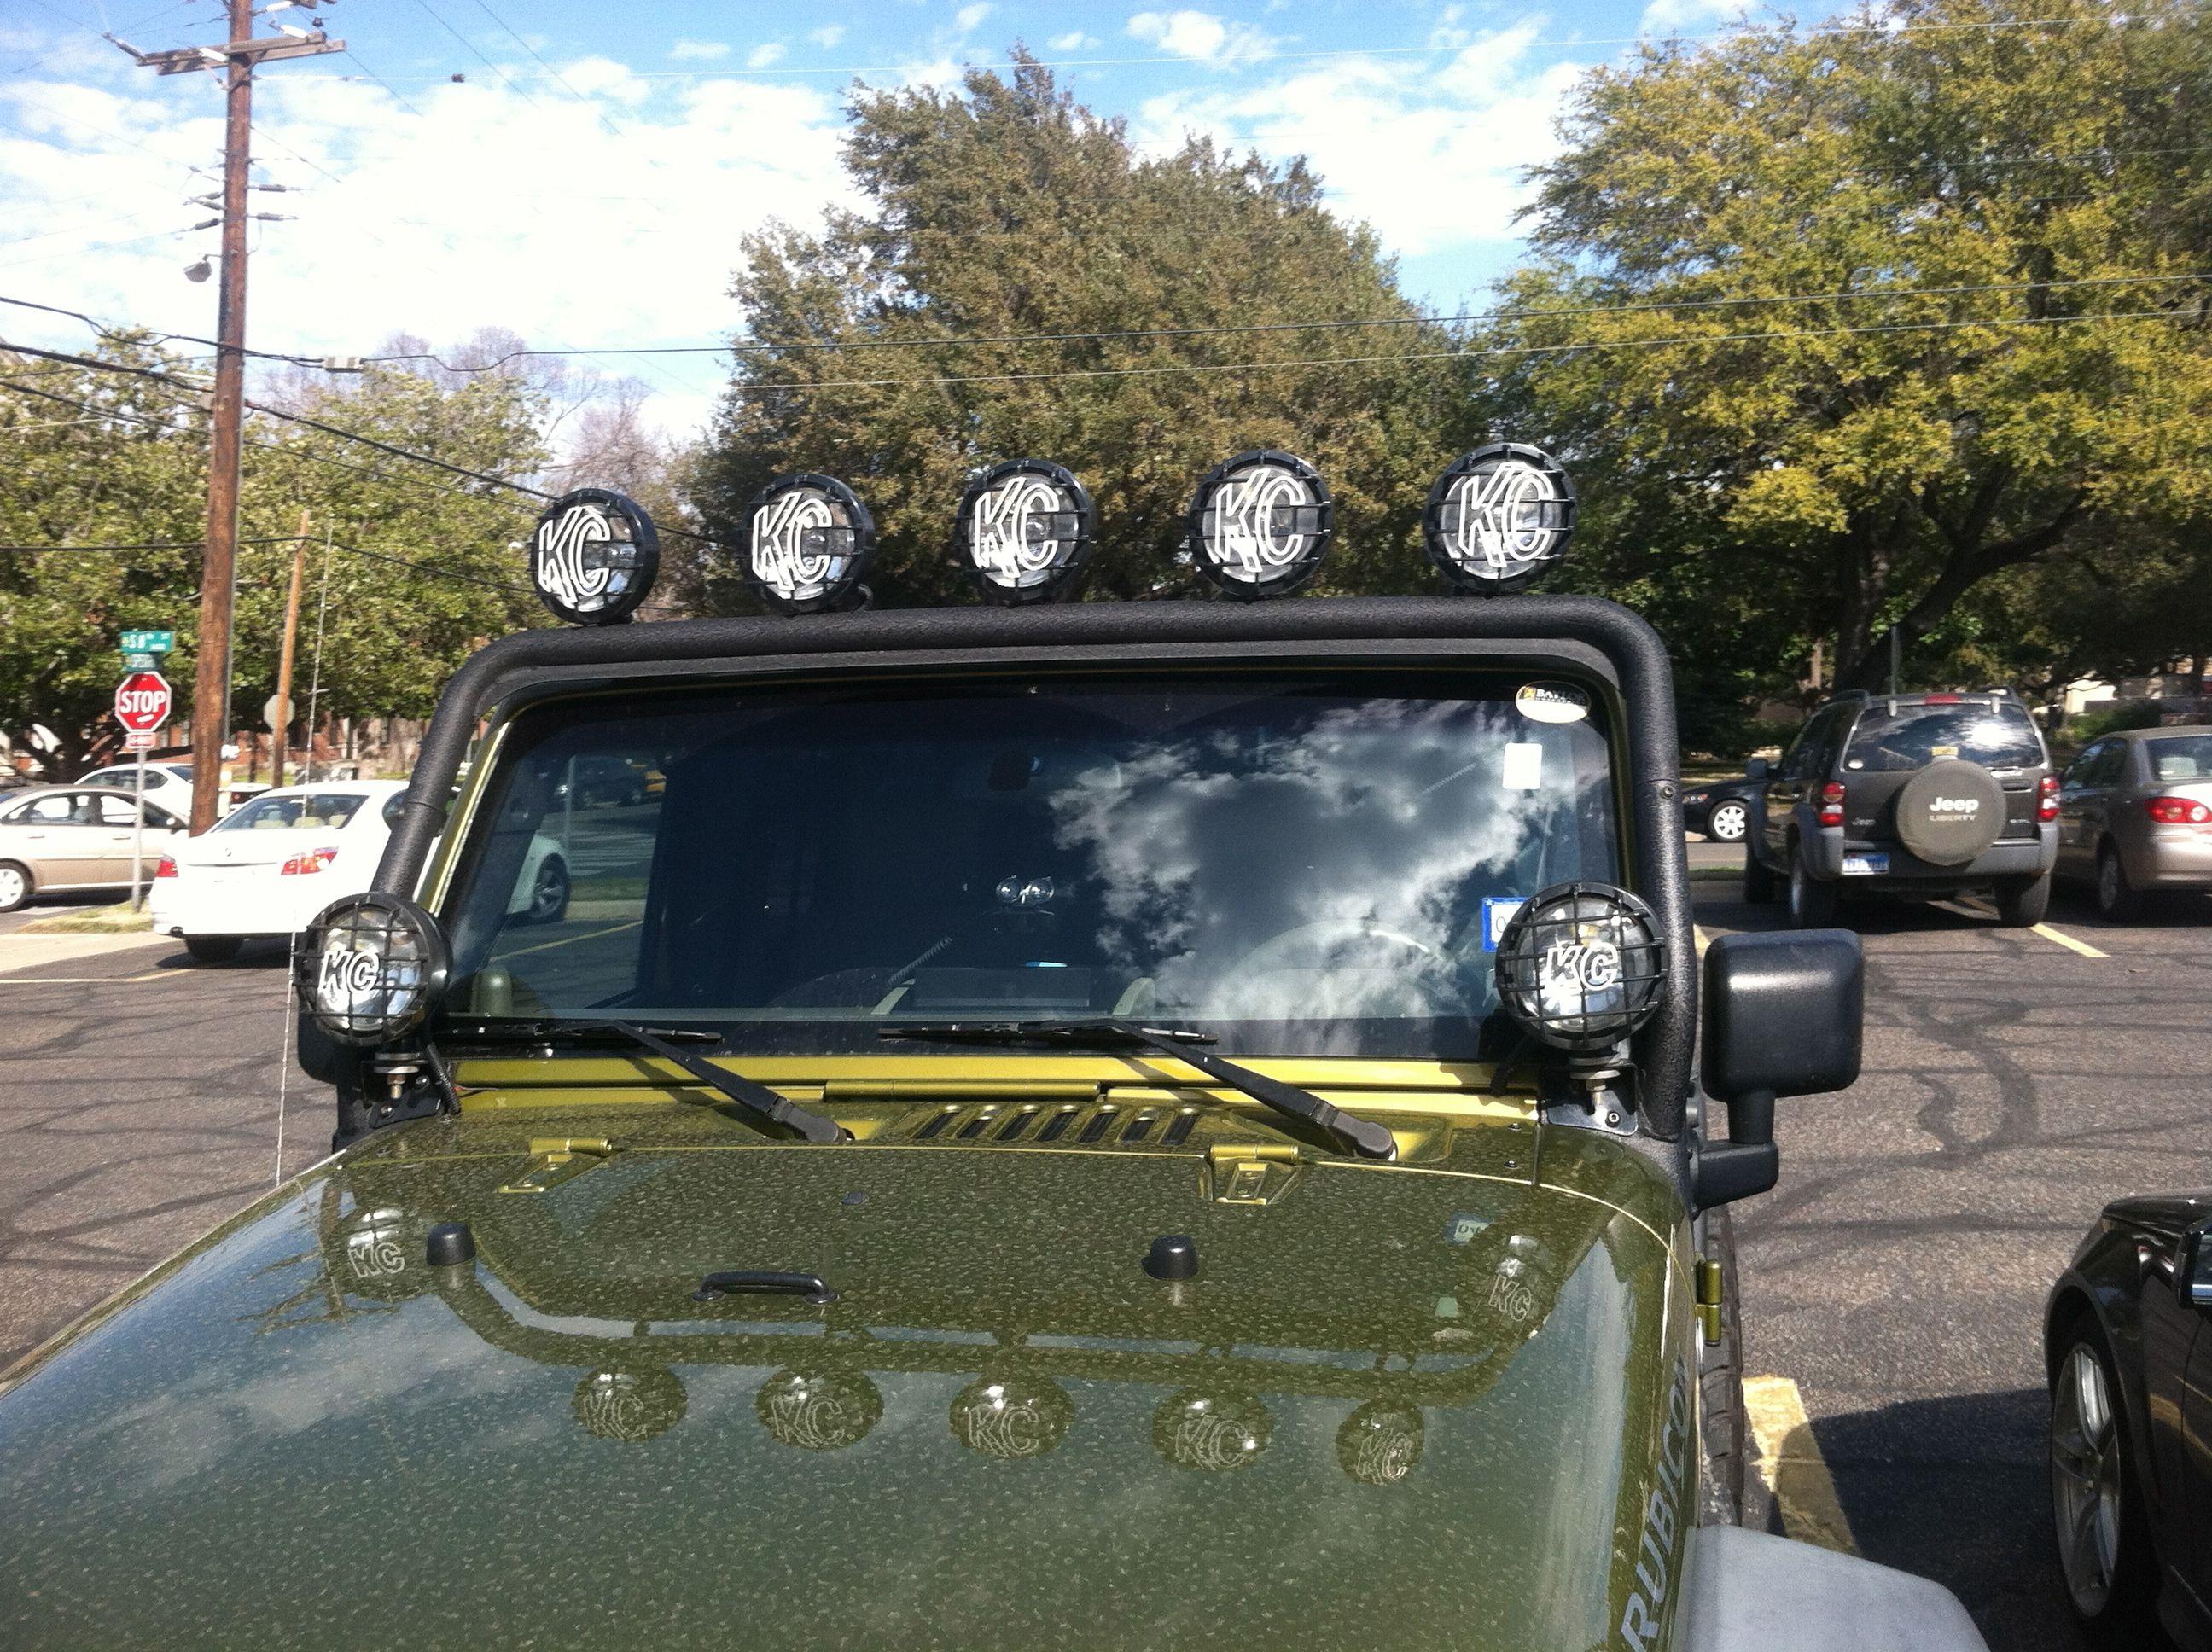 Kc Hilights Overhead Bar 5 Bar Lights Two Sides Jeep Wrangler Parts Jeep Wrangler Tj Jeep Tj